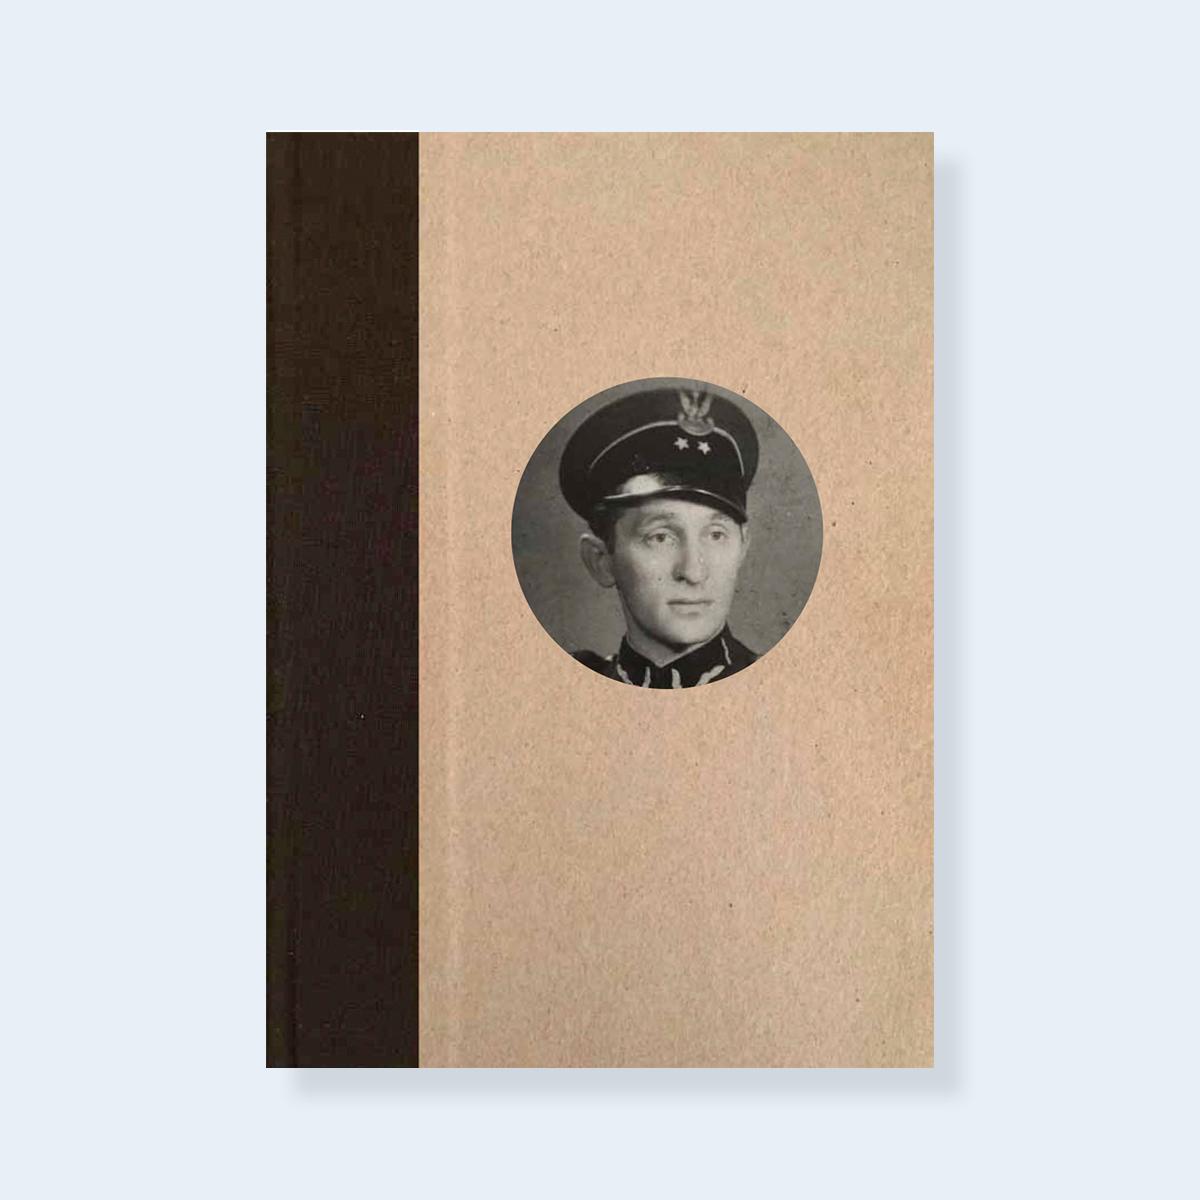 Leon Borensztein | Tata | One Picture Book Two #11 |  Order >